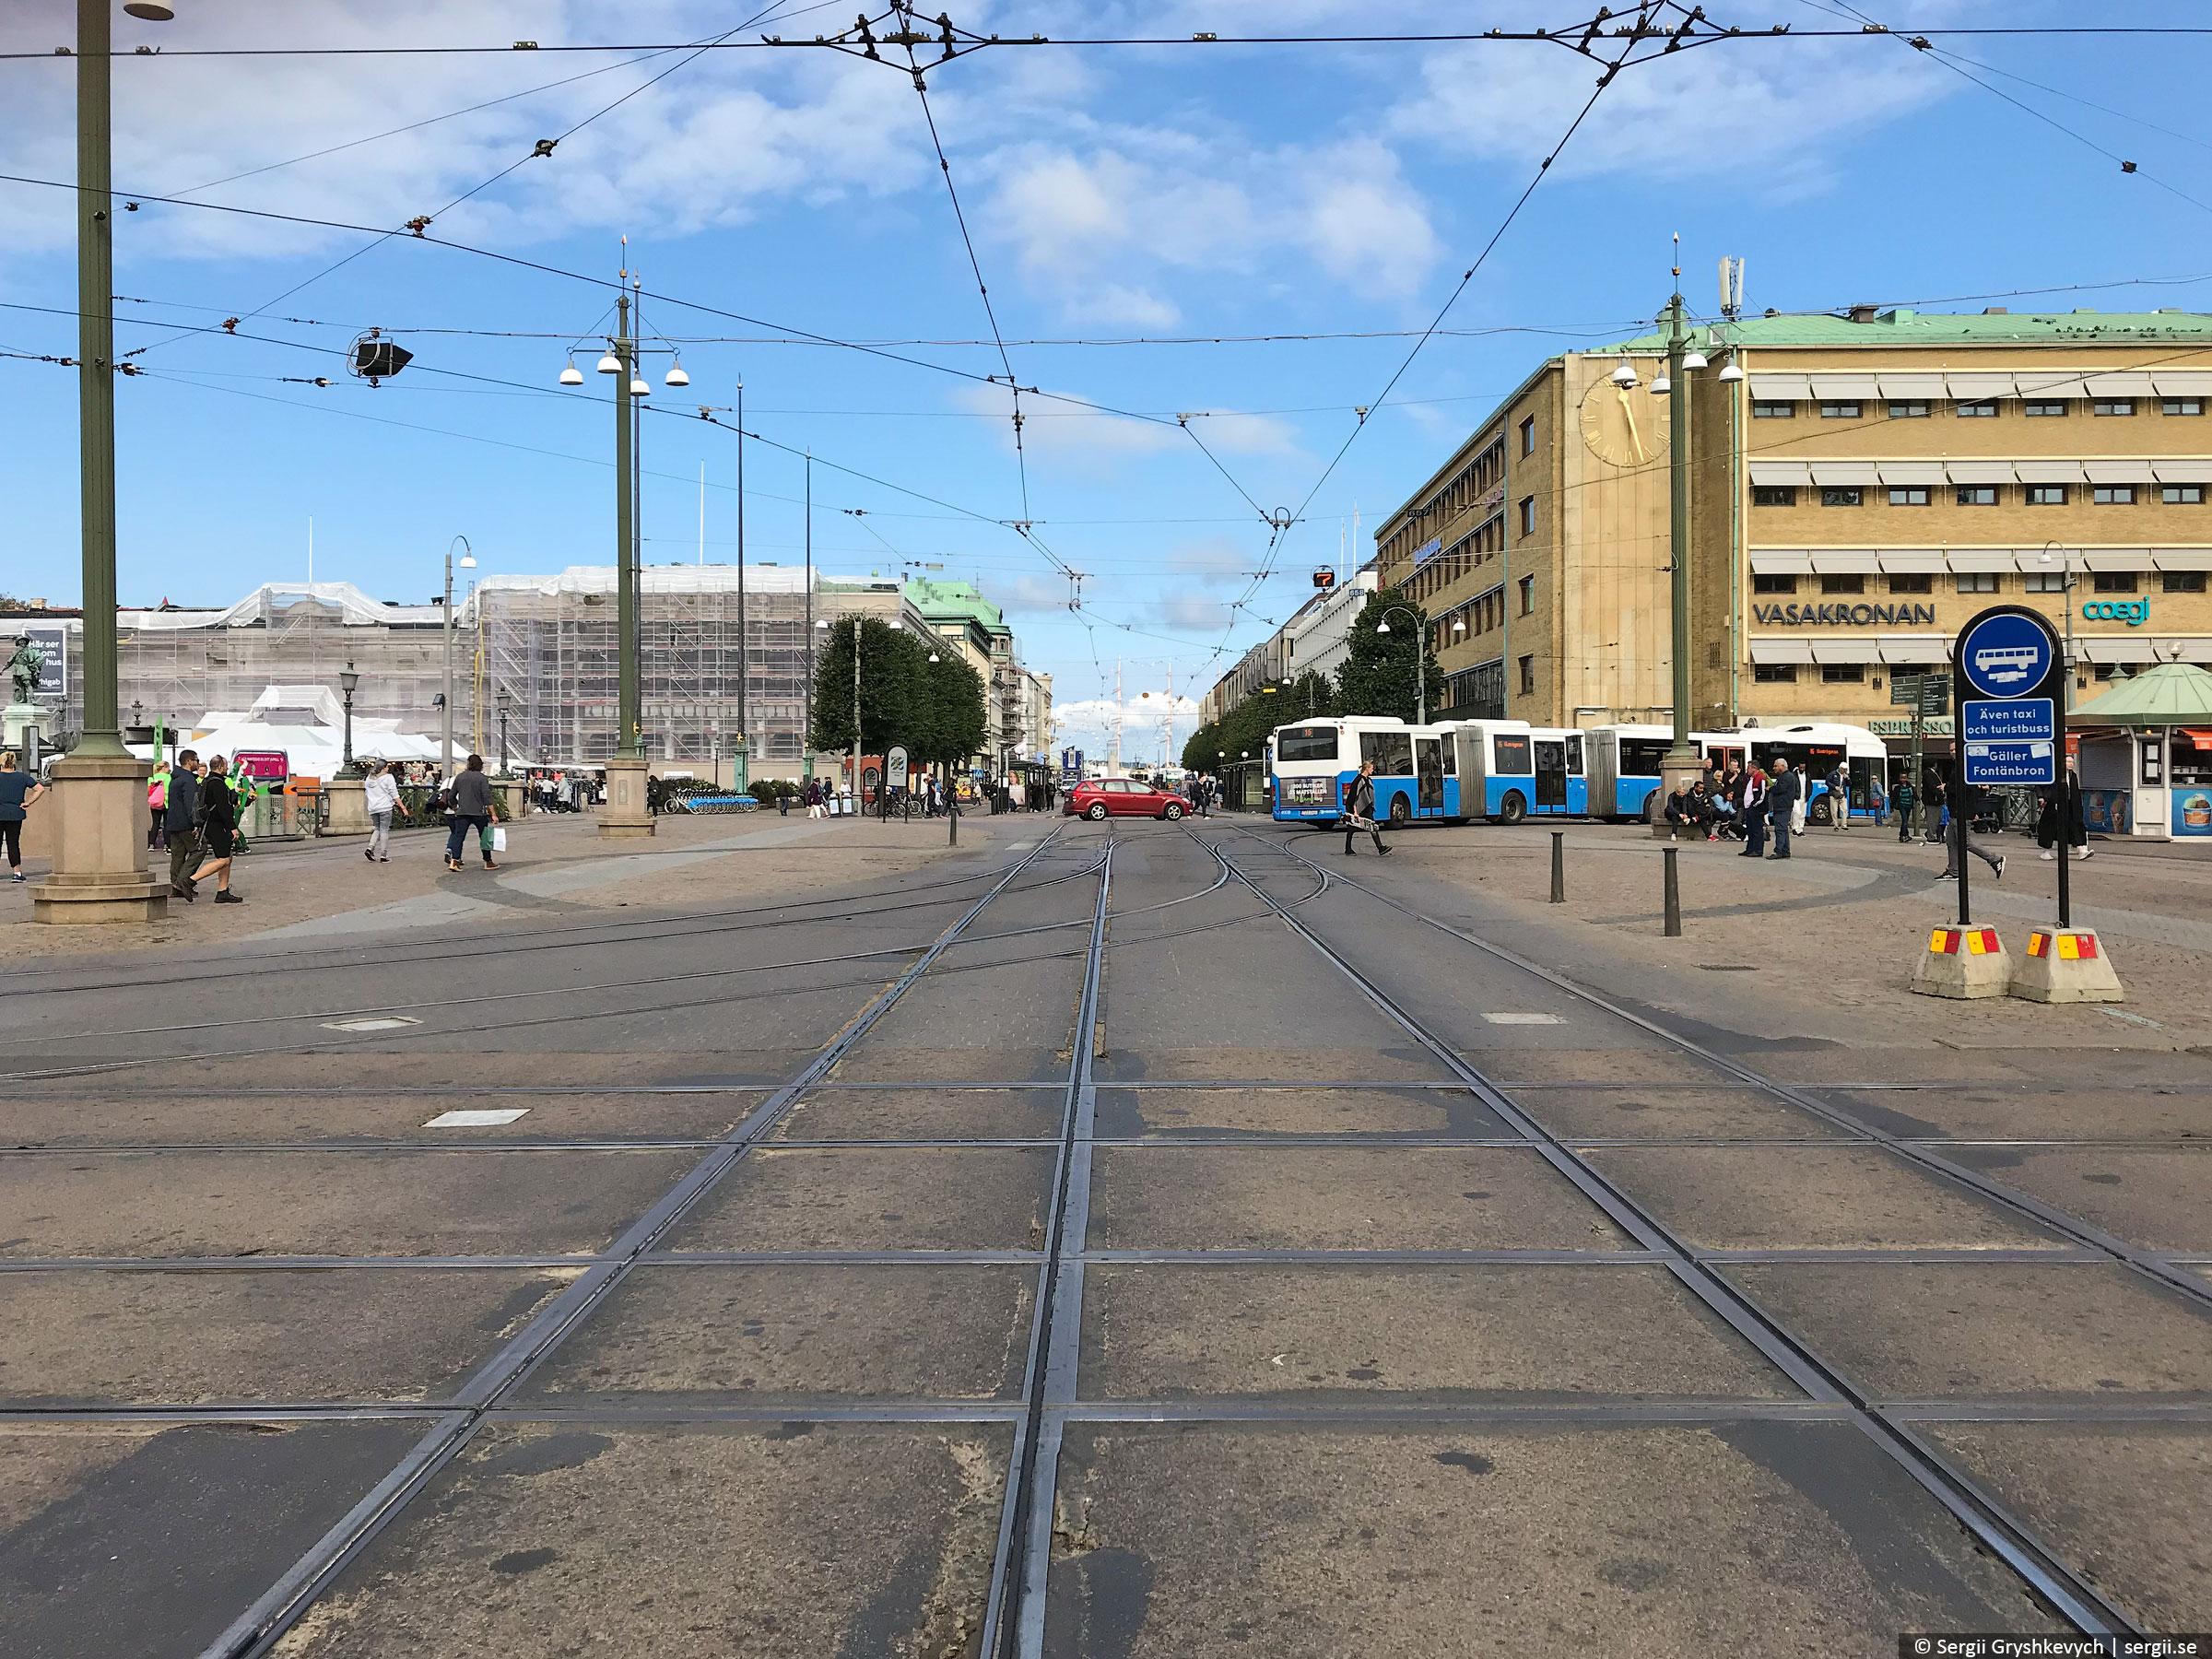 göteborg-ghotenburg-sweden-2018-17